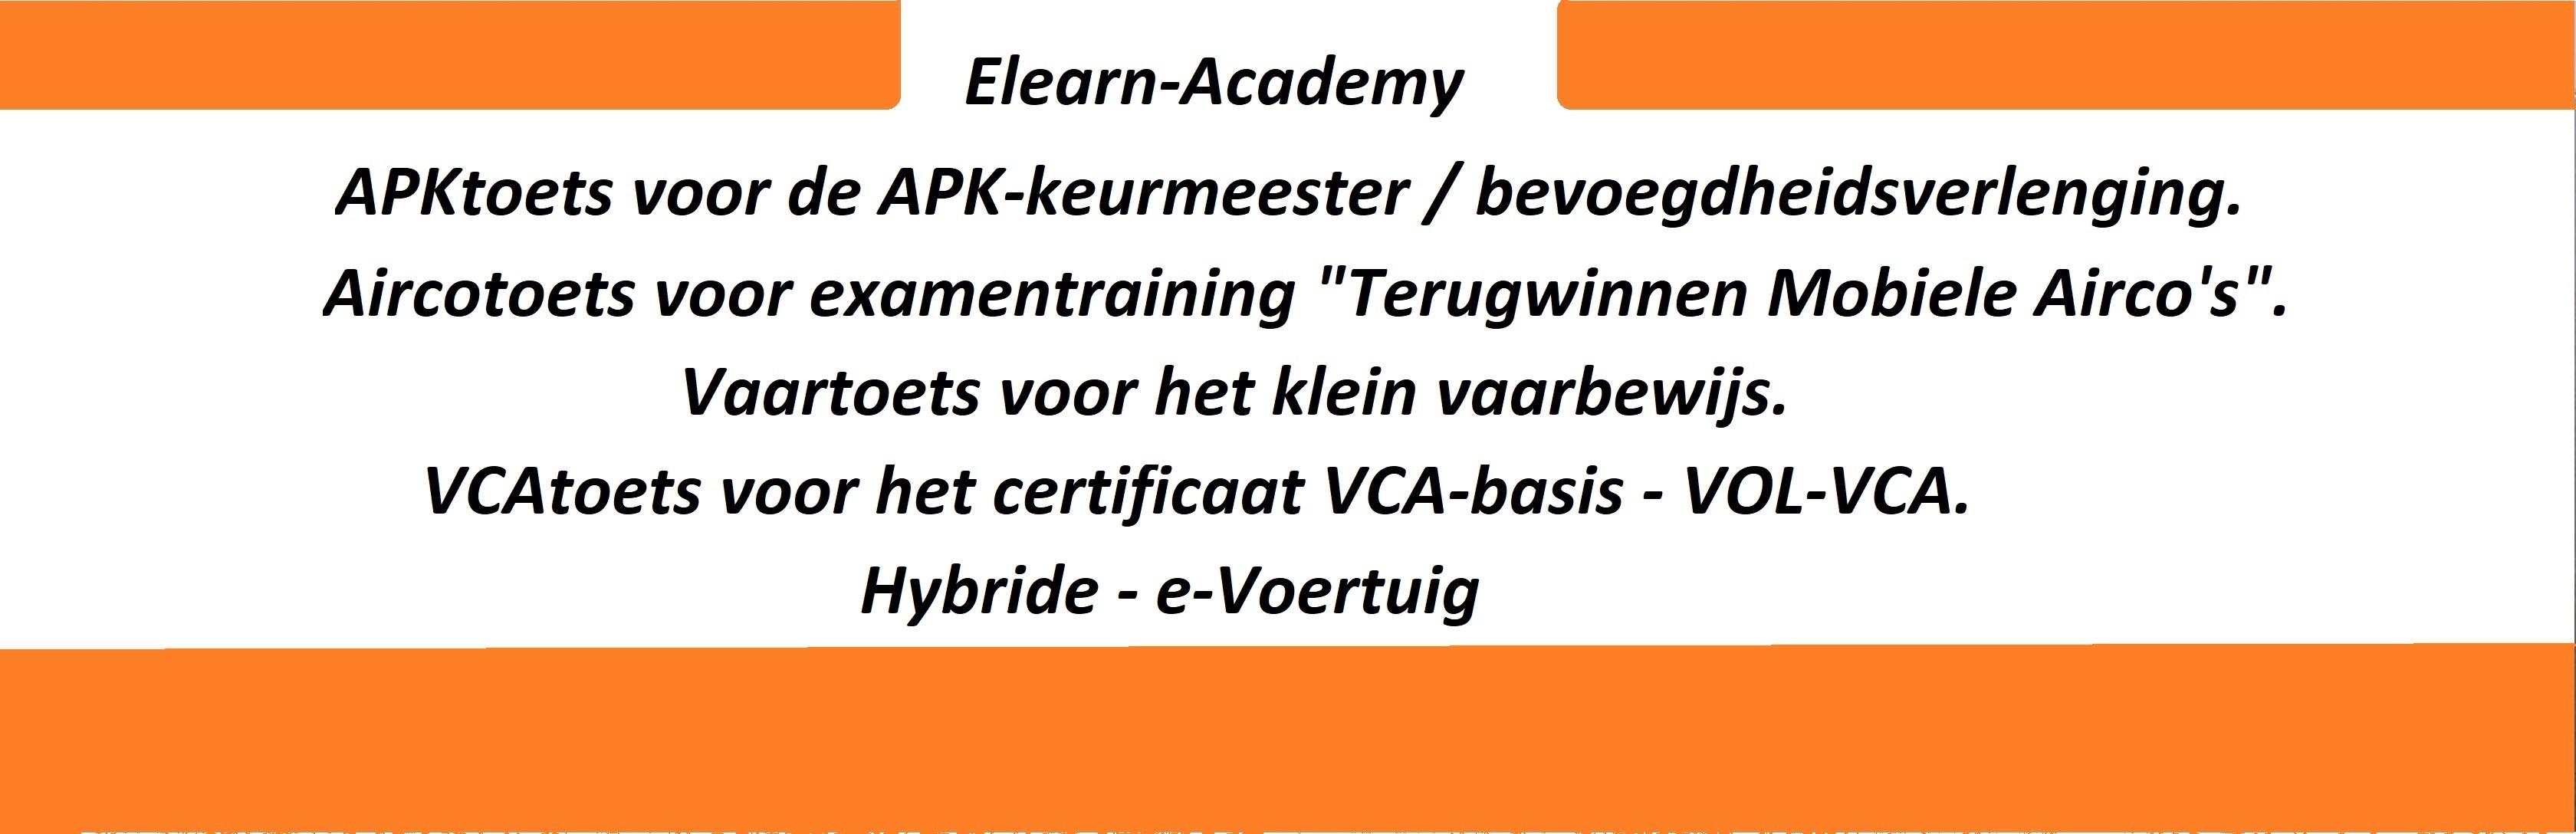 Elearn-academy